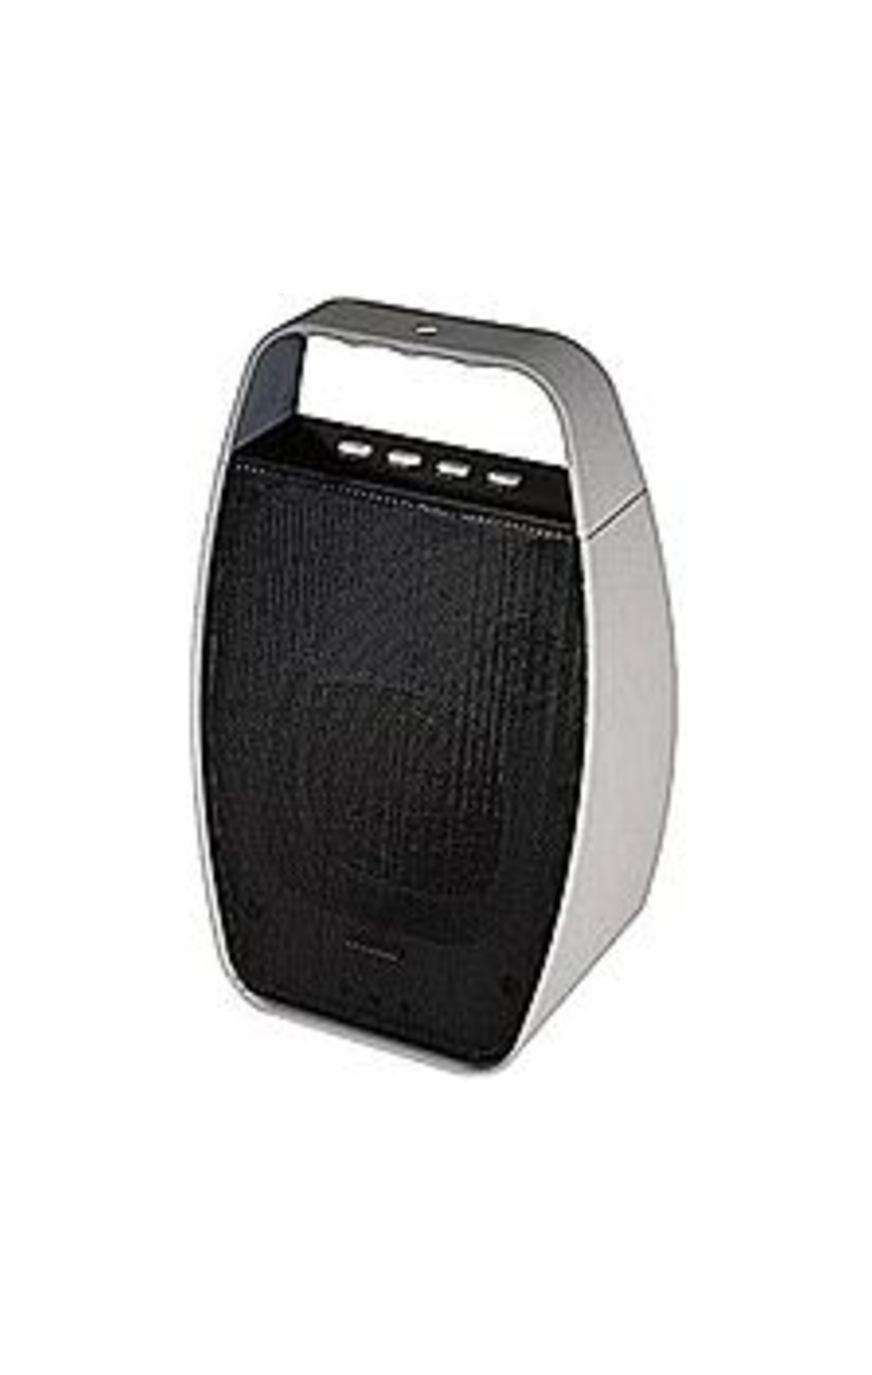 NXG Technology NX-WRLSM-GRAY Portable Wireless Bluetooth Speaker - Gray